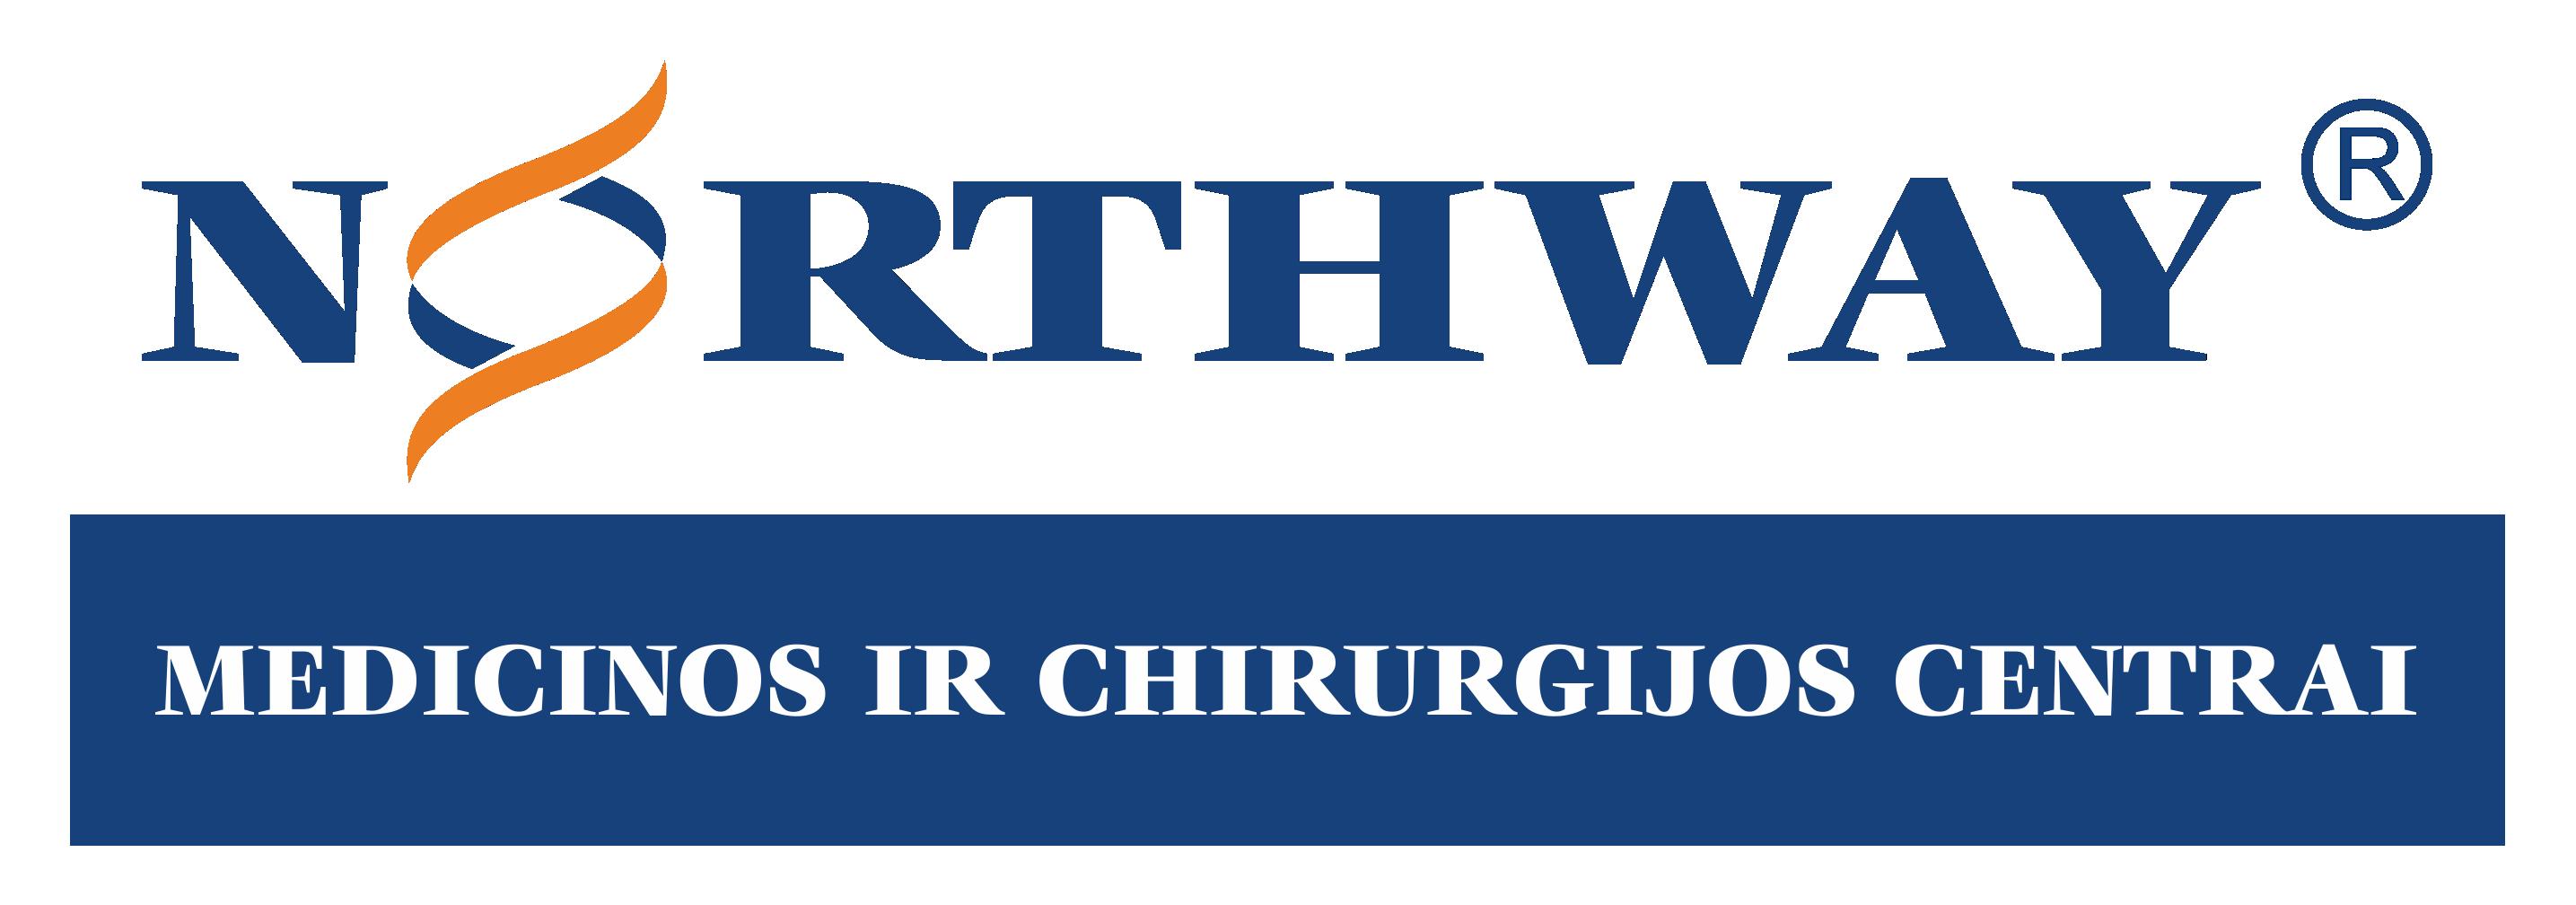 northway-medicinos-ir-chirurgijos-centrai